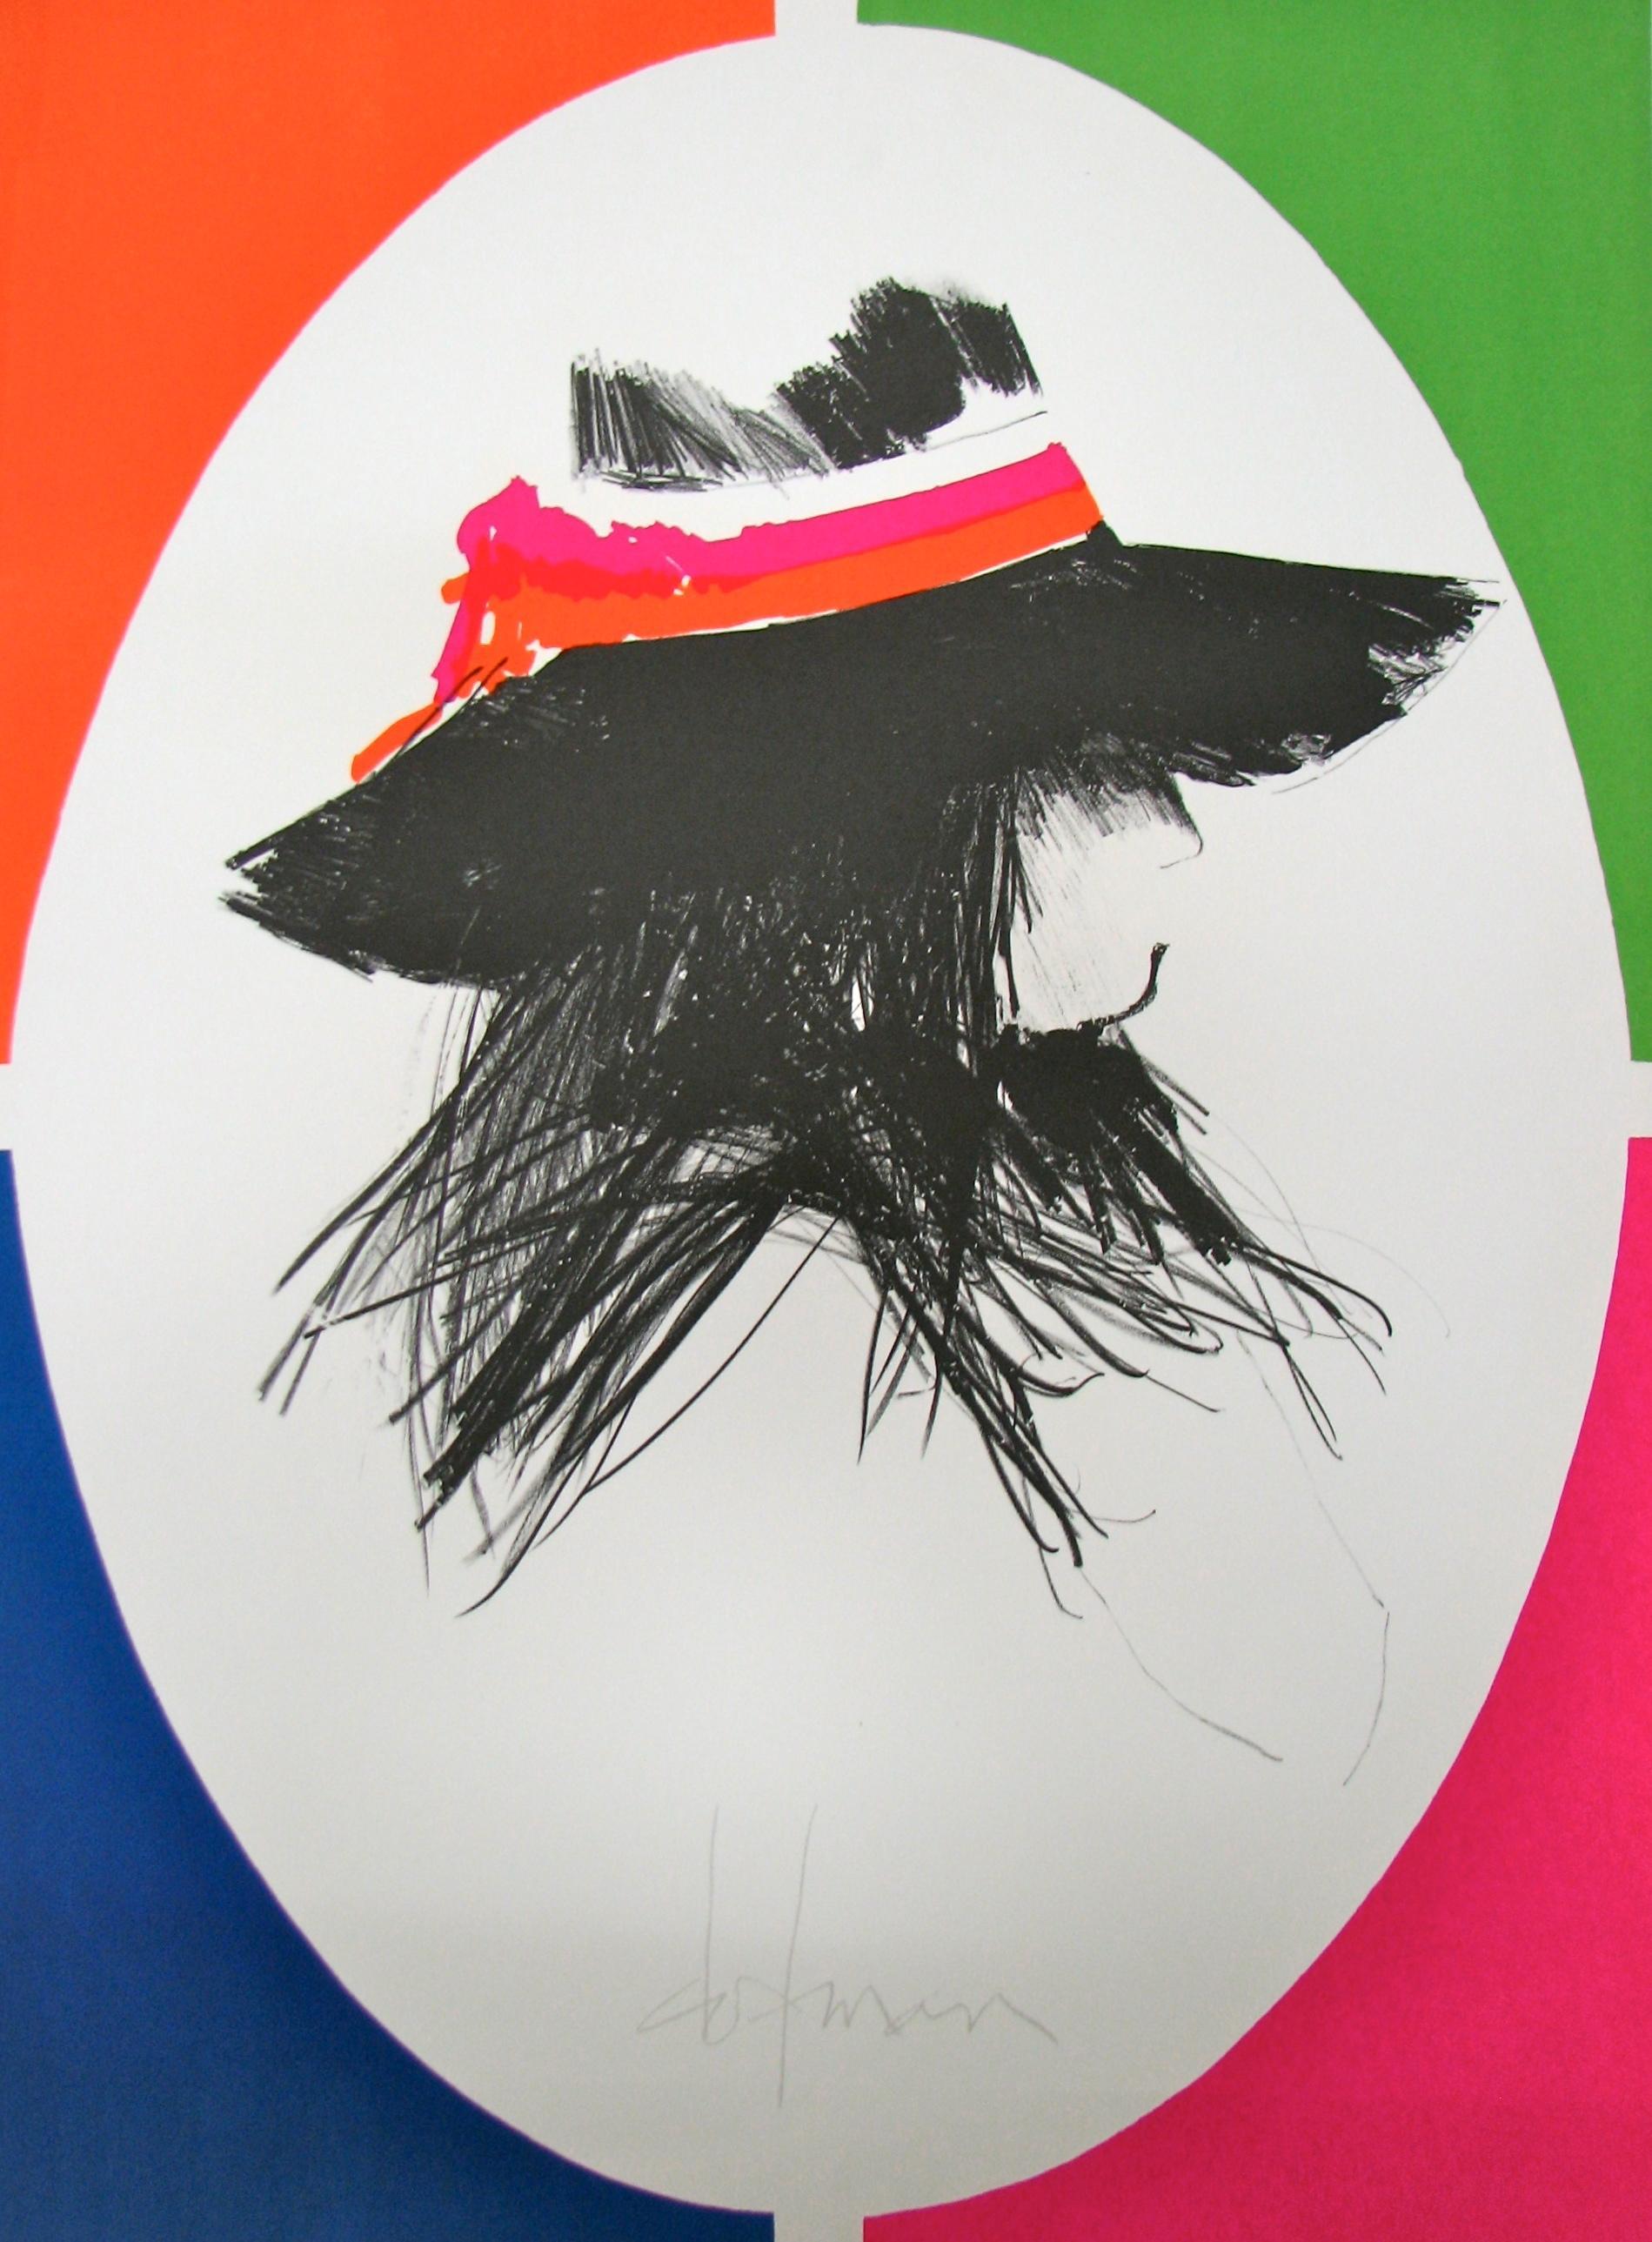 The Black Hat by Bruce Dorfman